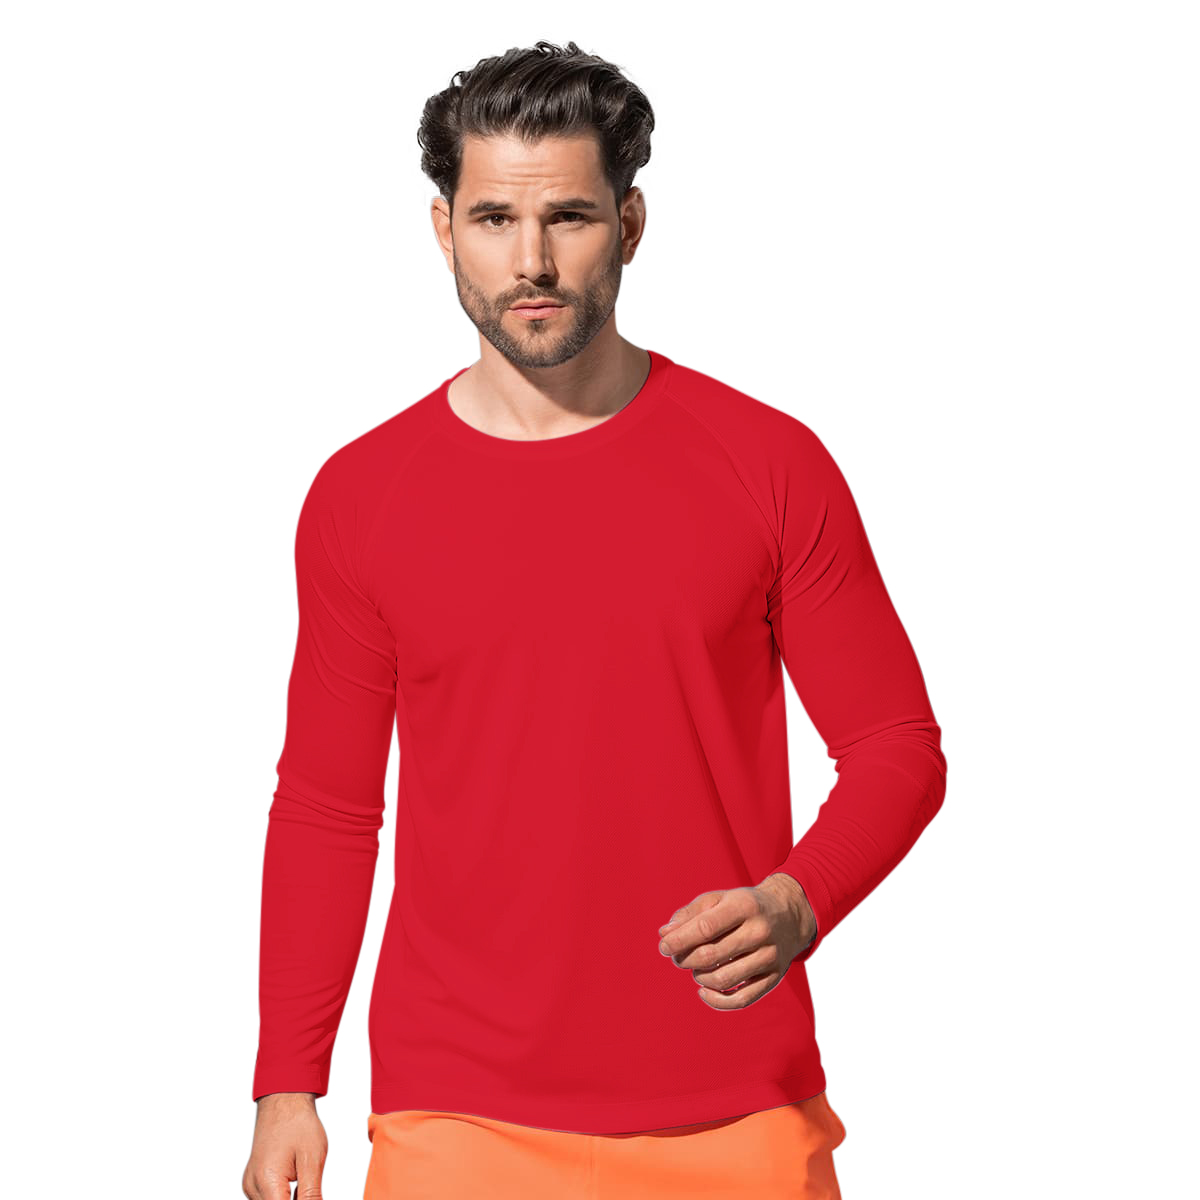 Stedman-Mens-Active-140-Long-Sleeved-Tee-AB344